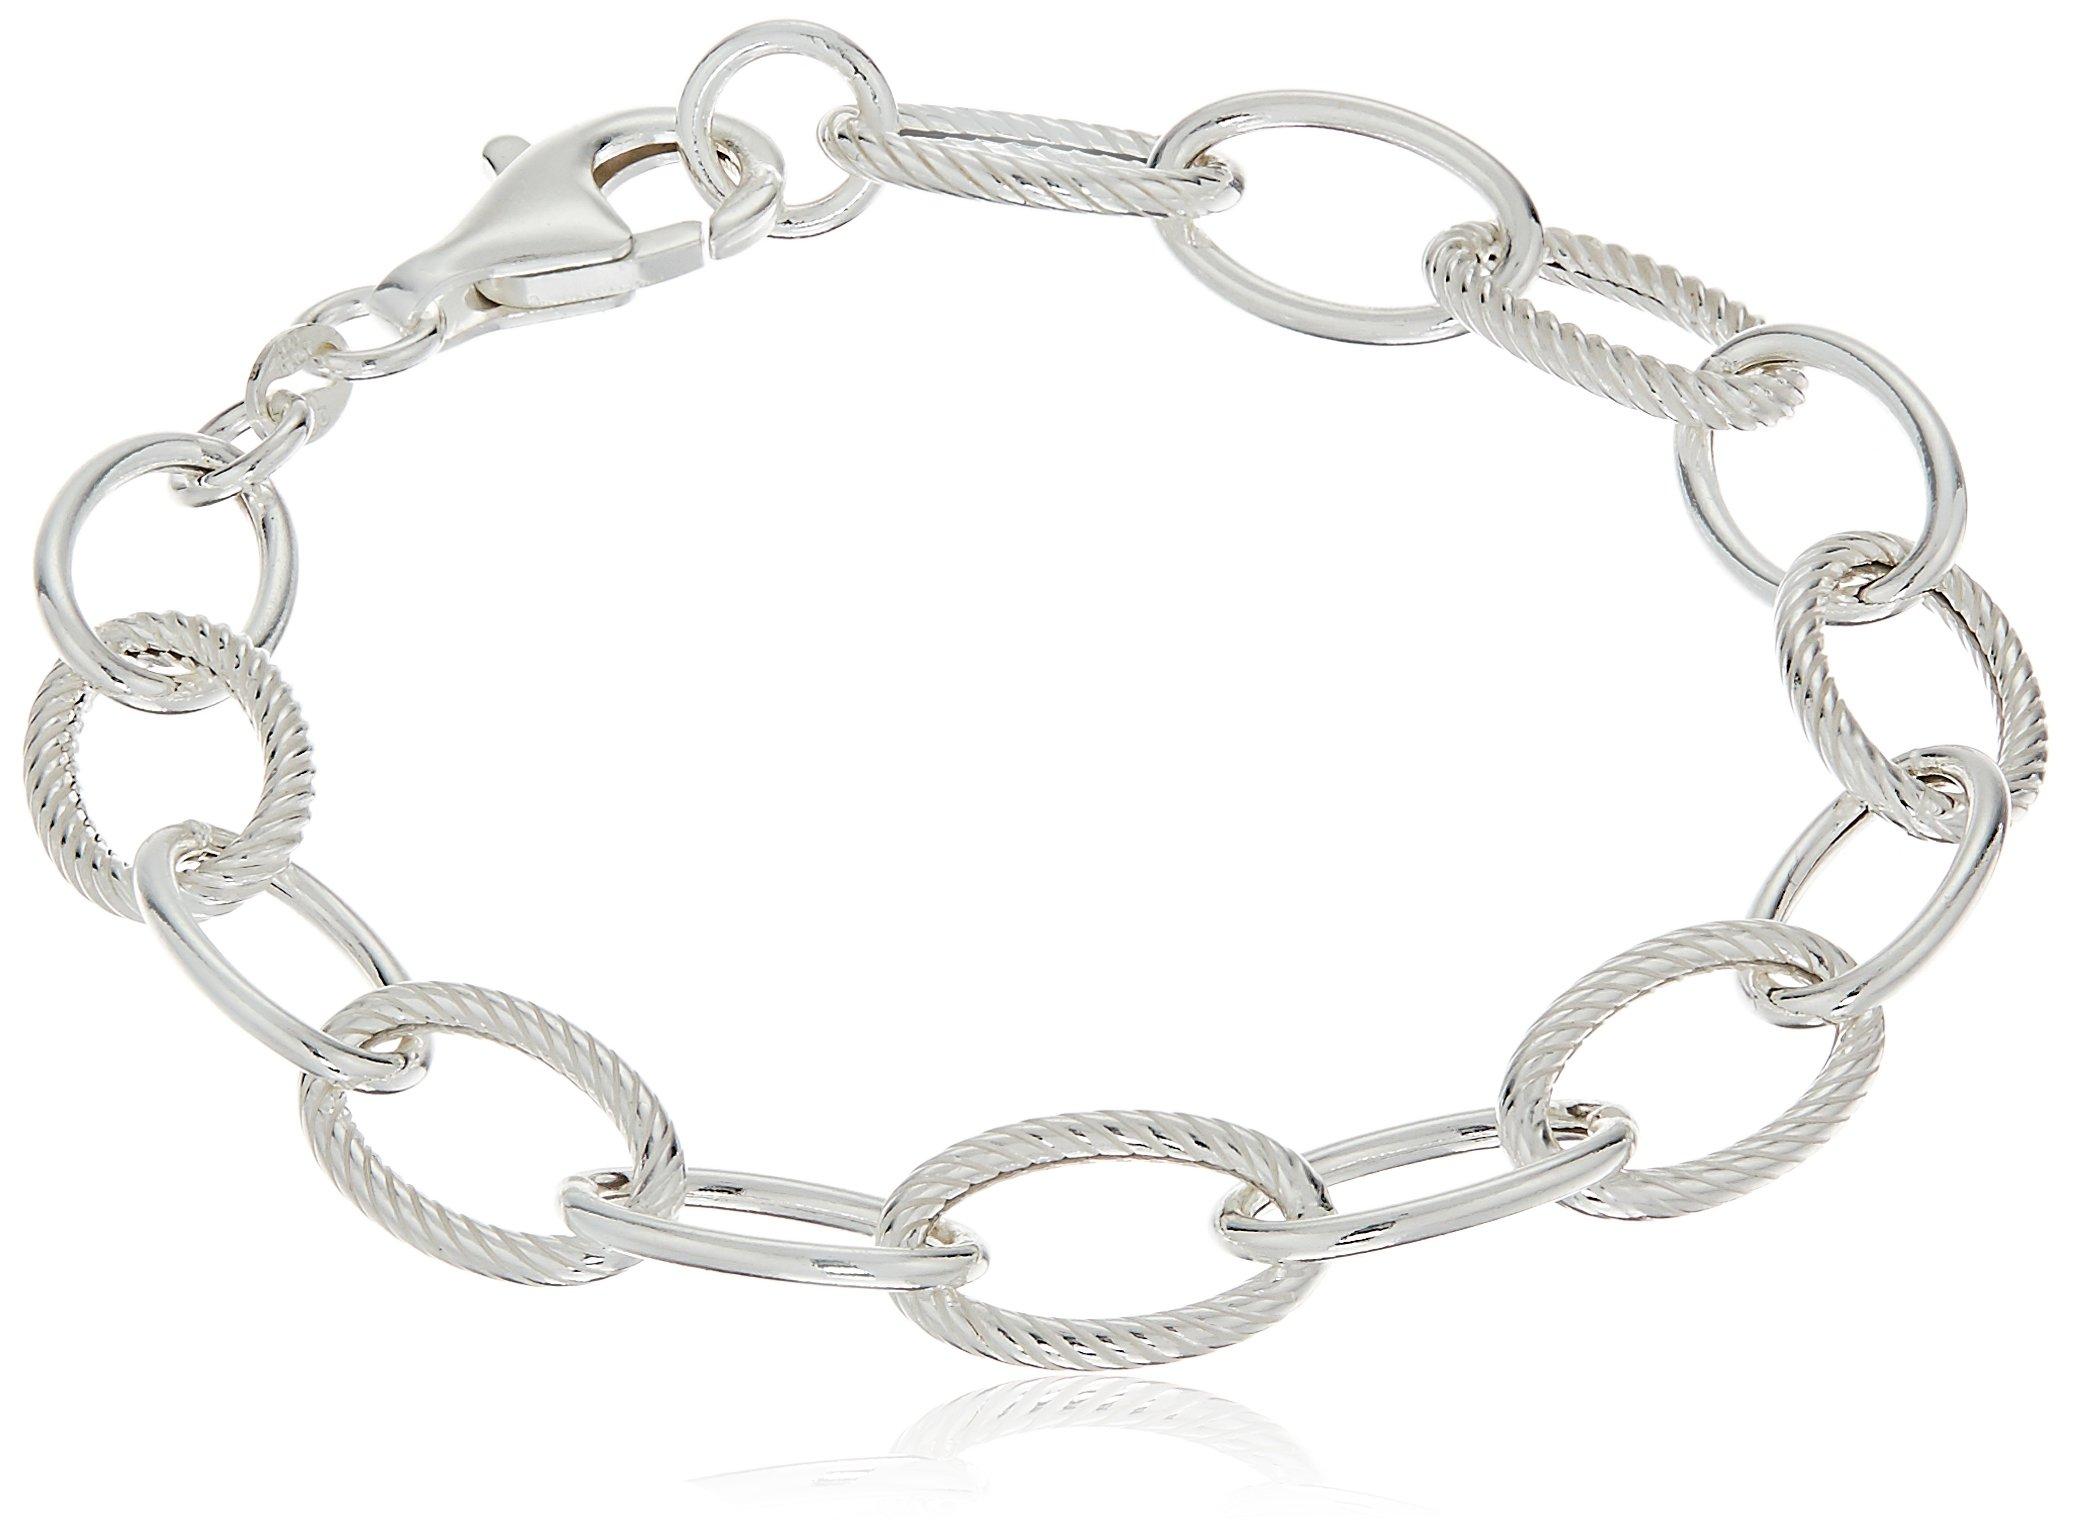 Sterling Silver Twisted and Polished Oval Link Bracelet, 7.5''